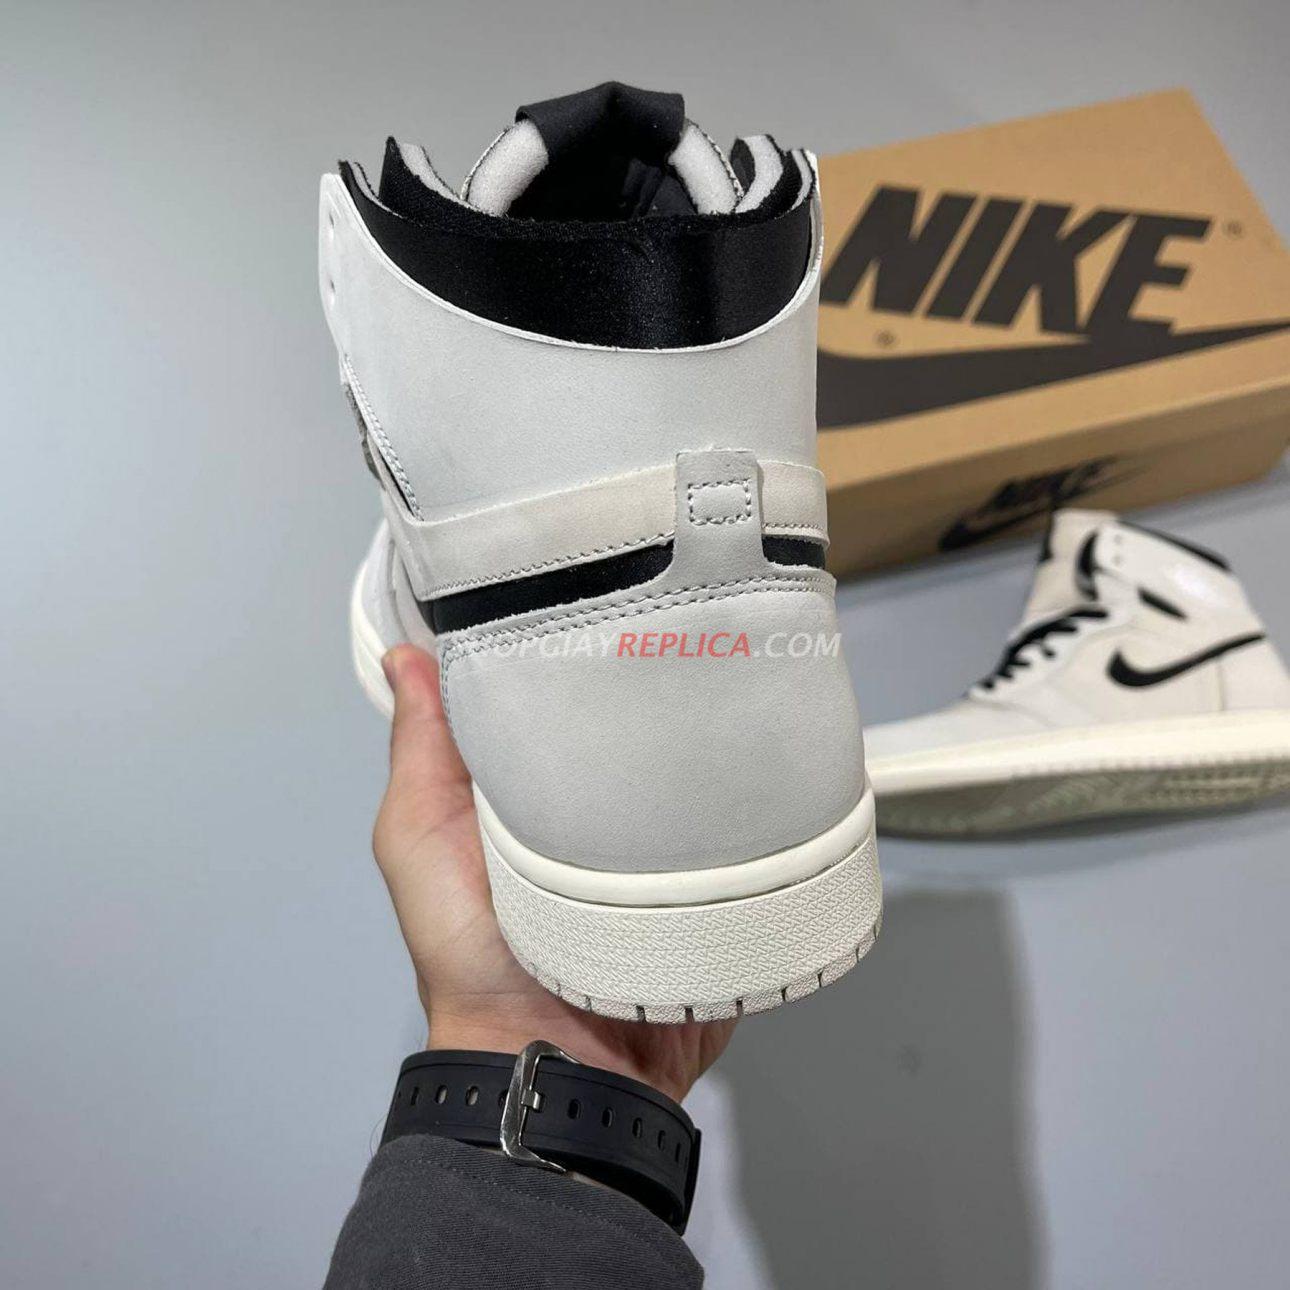 Giày Nike Air Jordan 1 Zoom Air Summit White Black rep 1:1